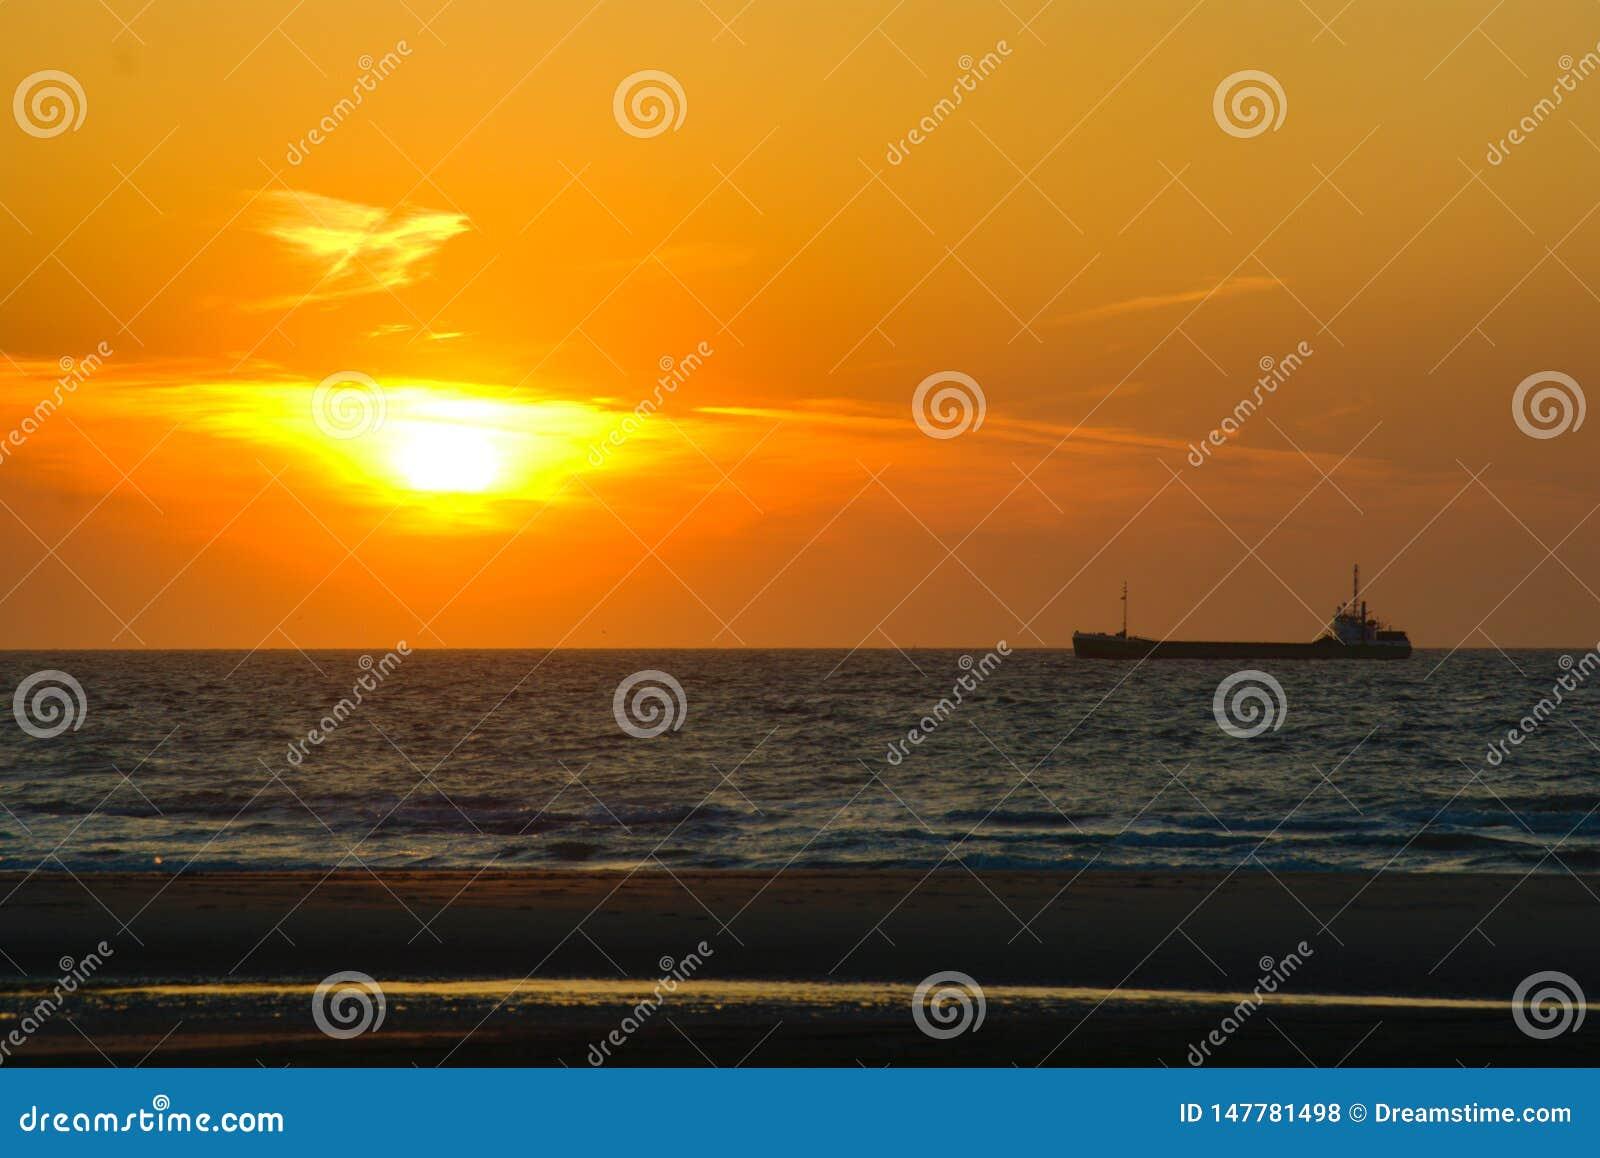 O navio de carga retorna para mover durante o por do sol